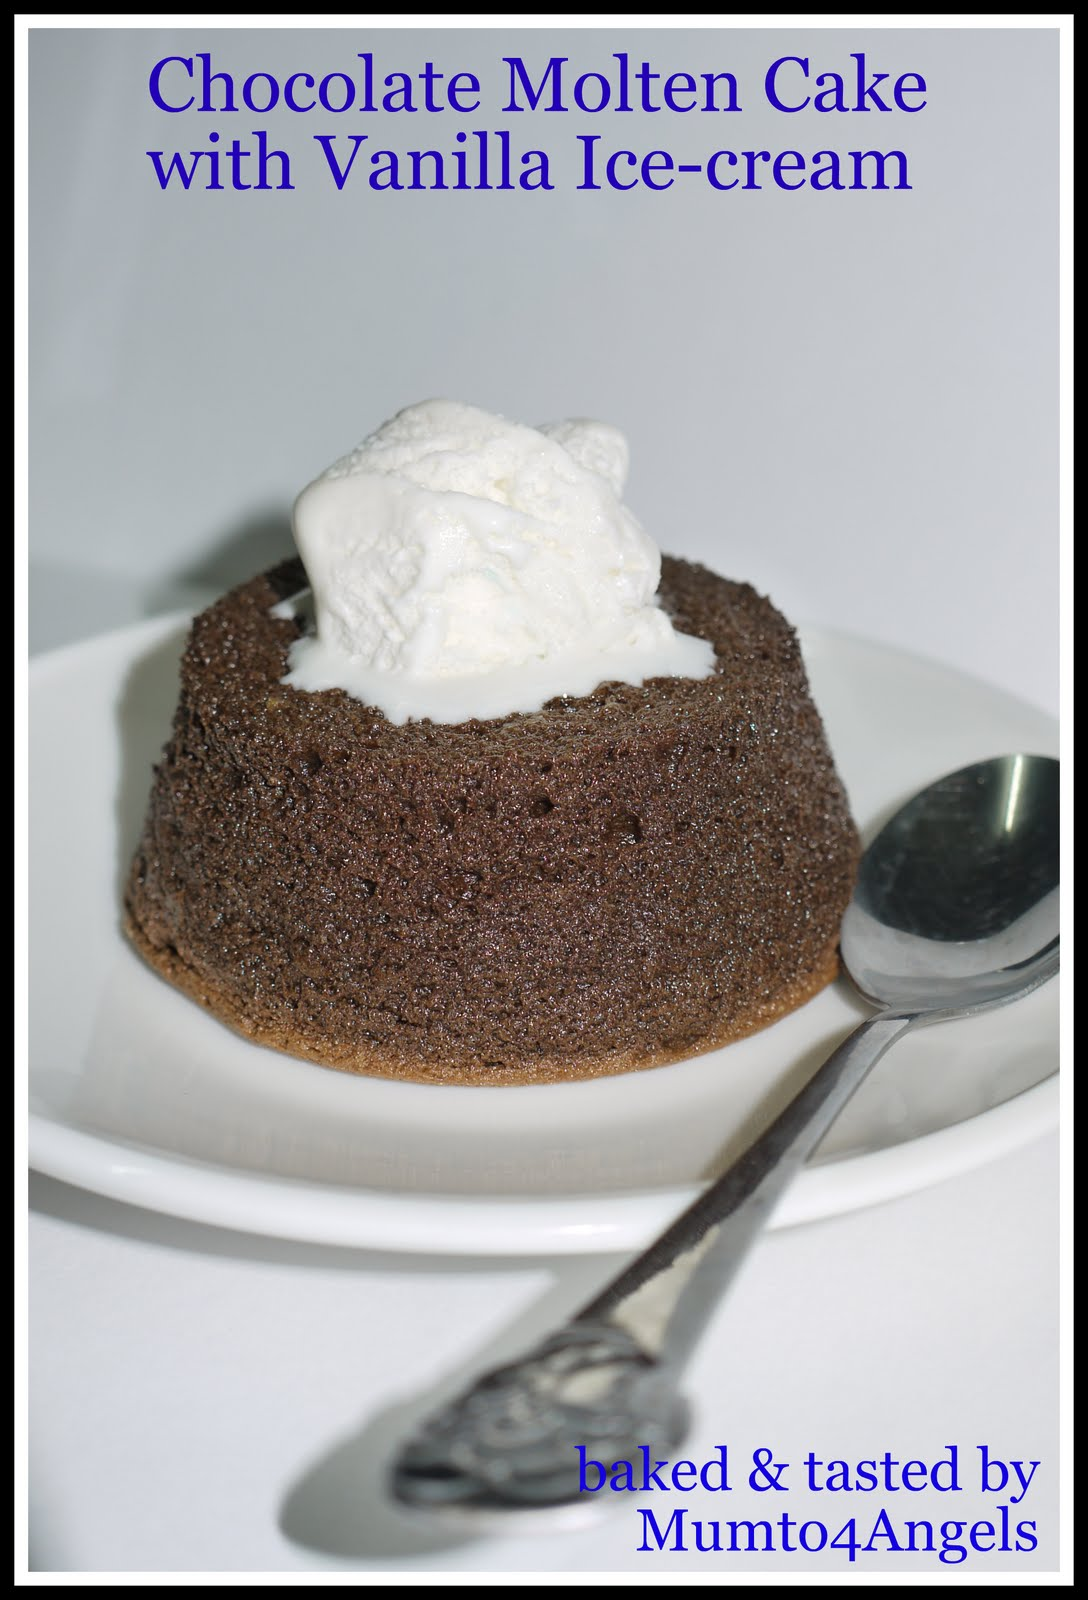 Mum to 4 Angels: Chocolate Molten Cake with Vanilla Ice-cream